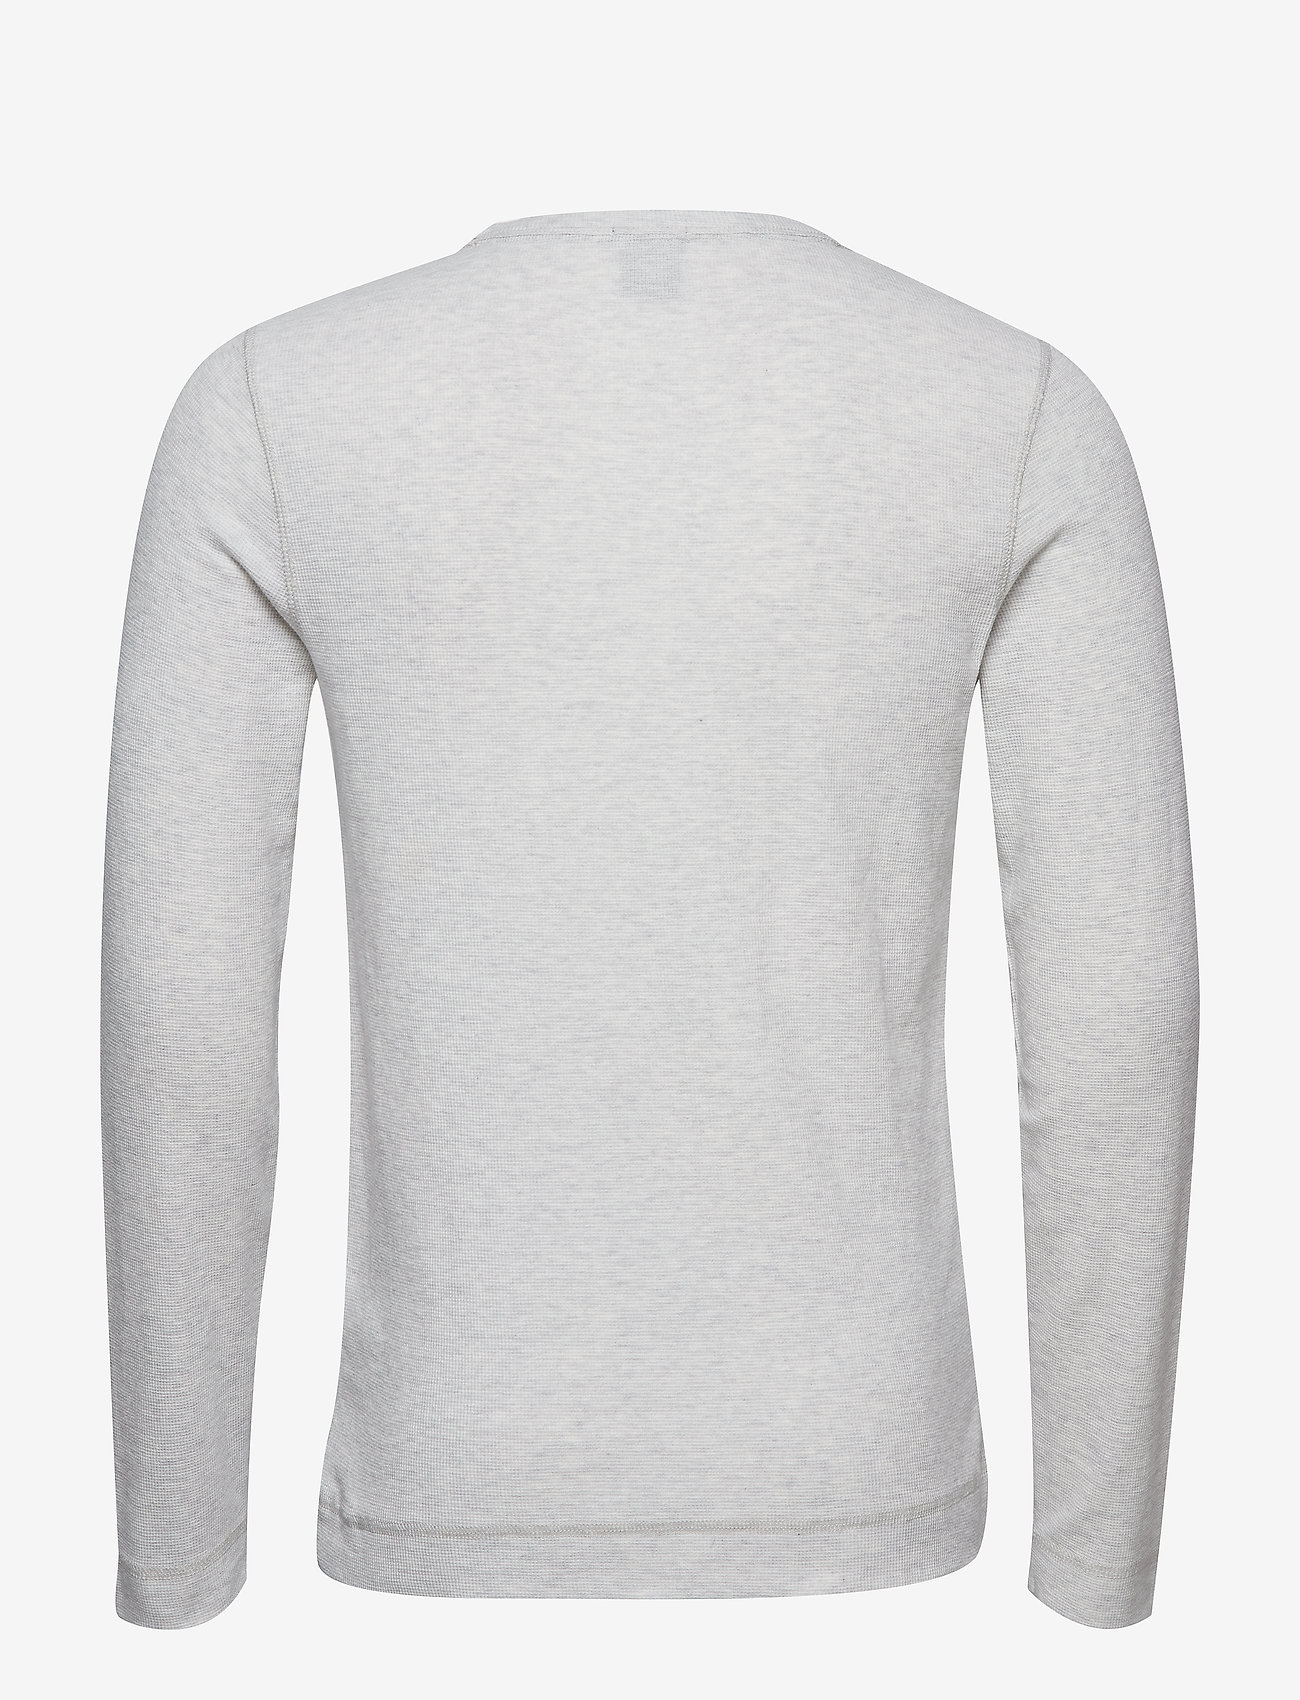 Boss Trix - T-shirts Natural